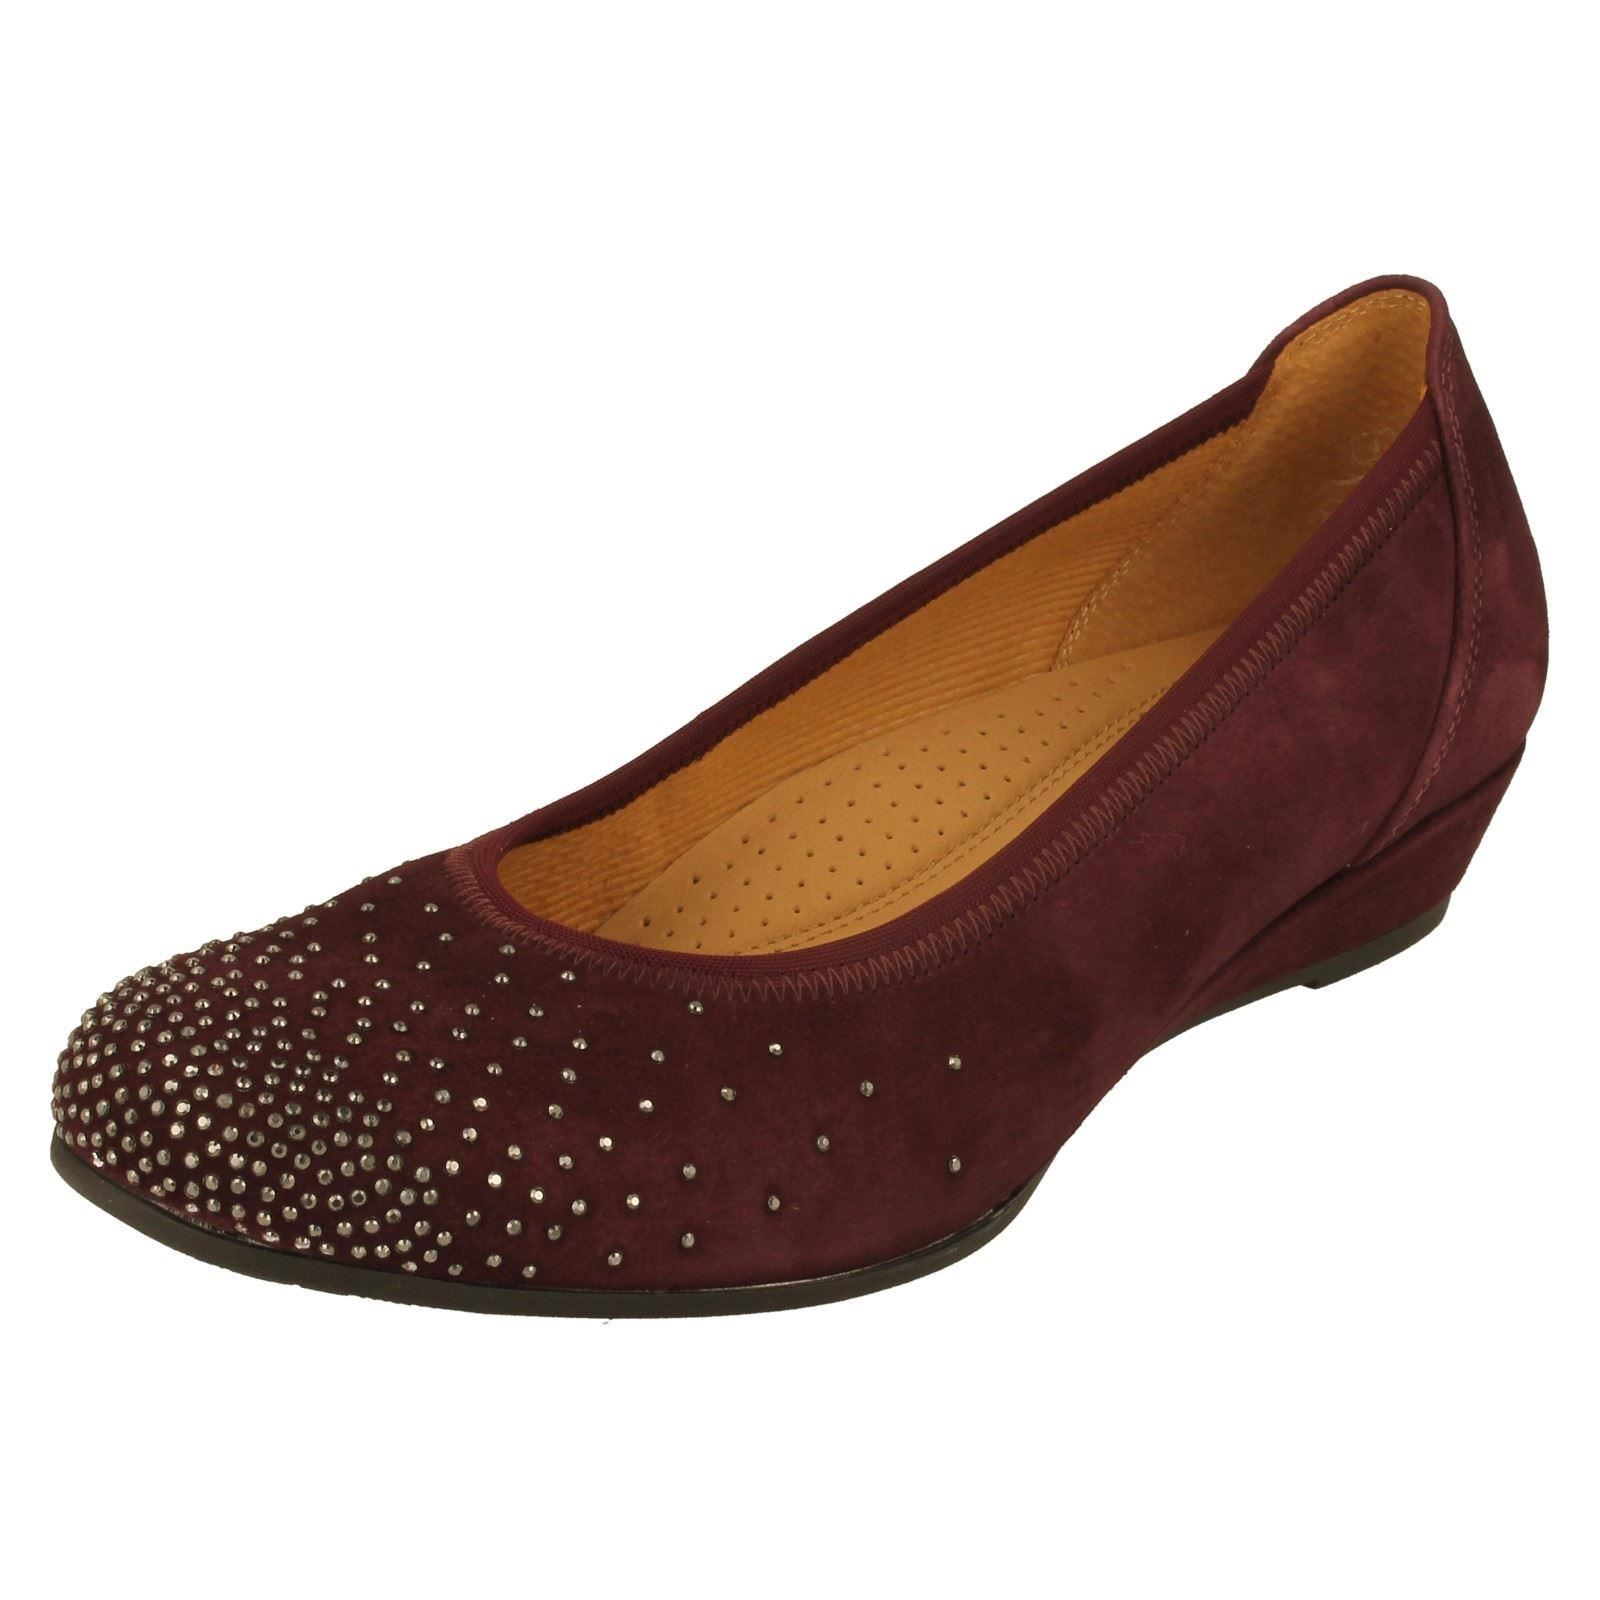 w 92694 New Label Merlot Ladies burgundy Gabor Shoes q1w7xxtI6